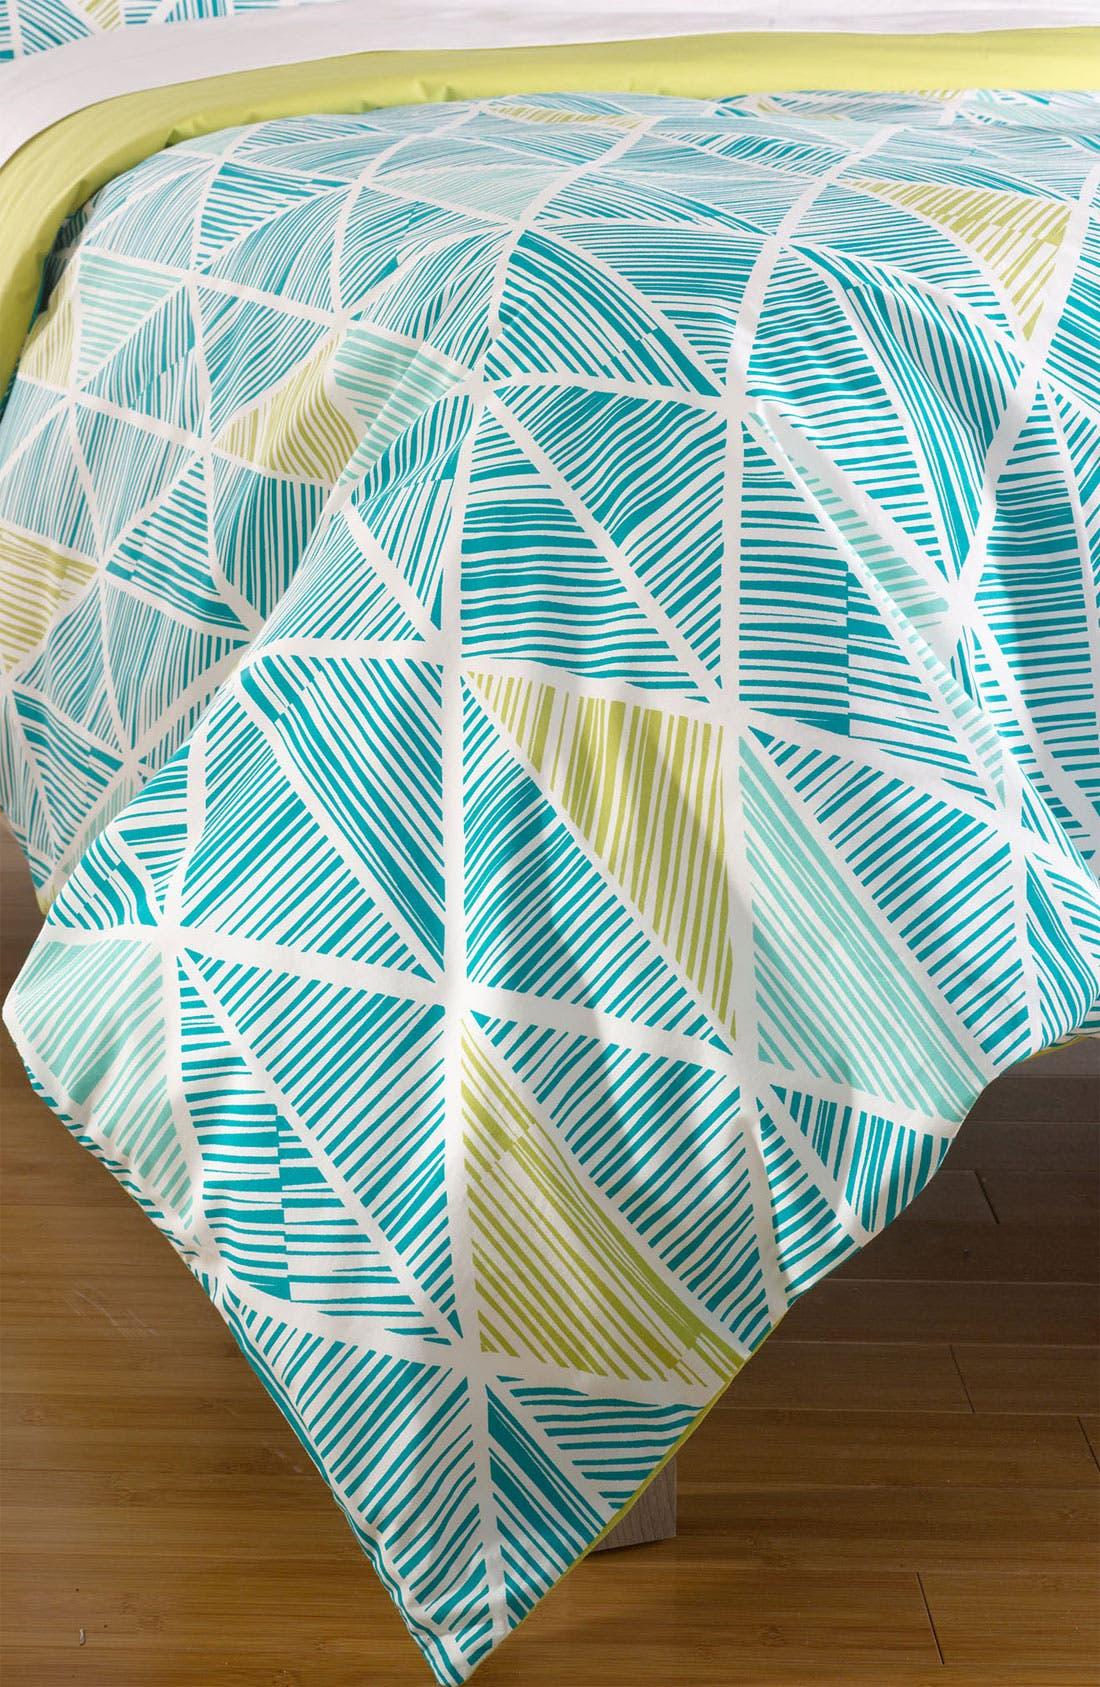 Alternate Image 1 Selected - Nordstrom at Home 'Matchstick Diamond' Duvet Cover